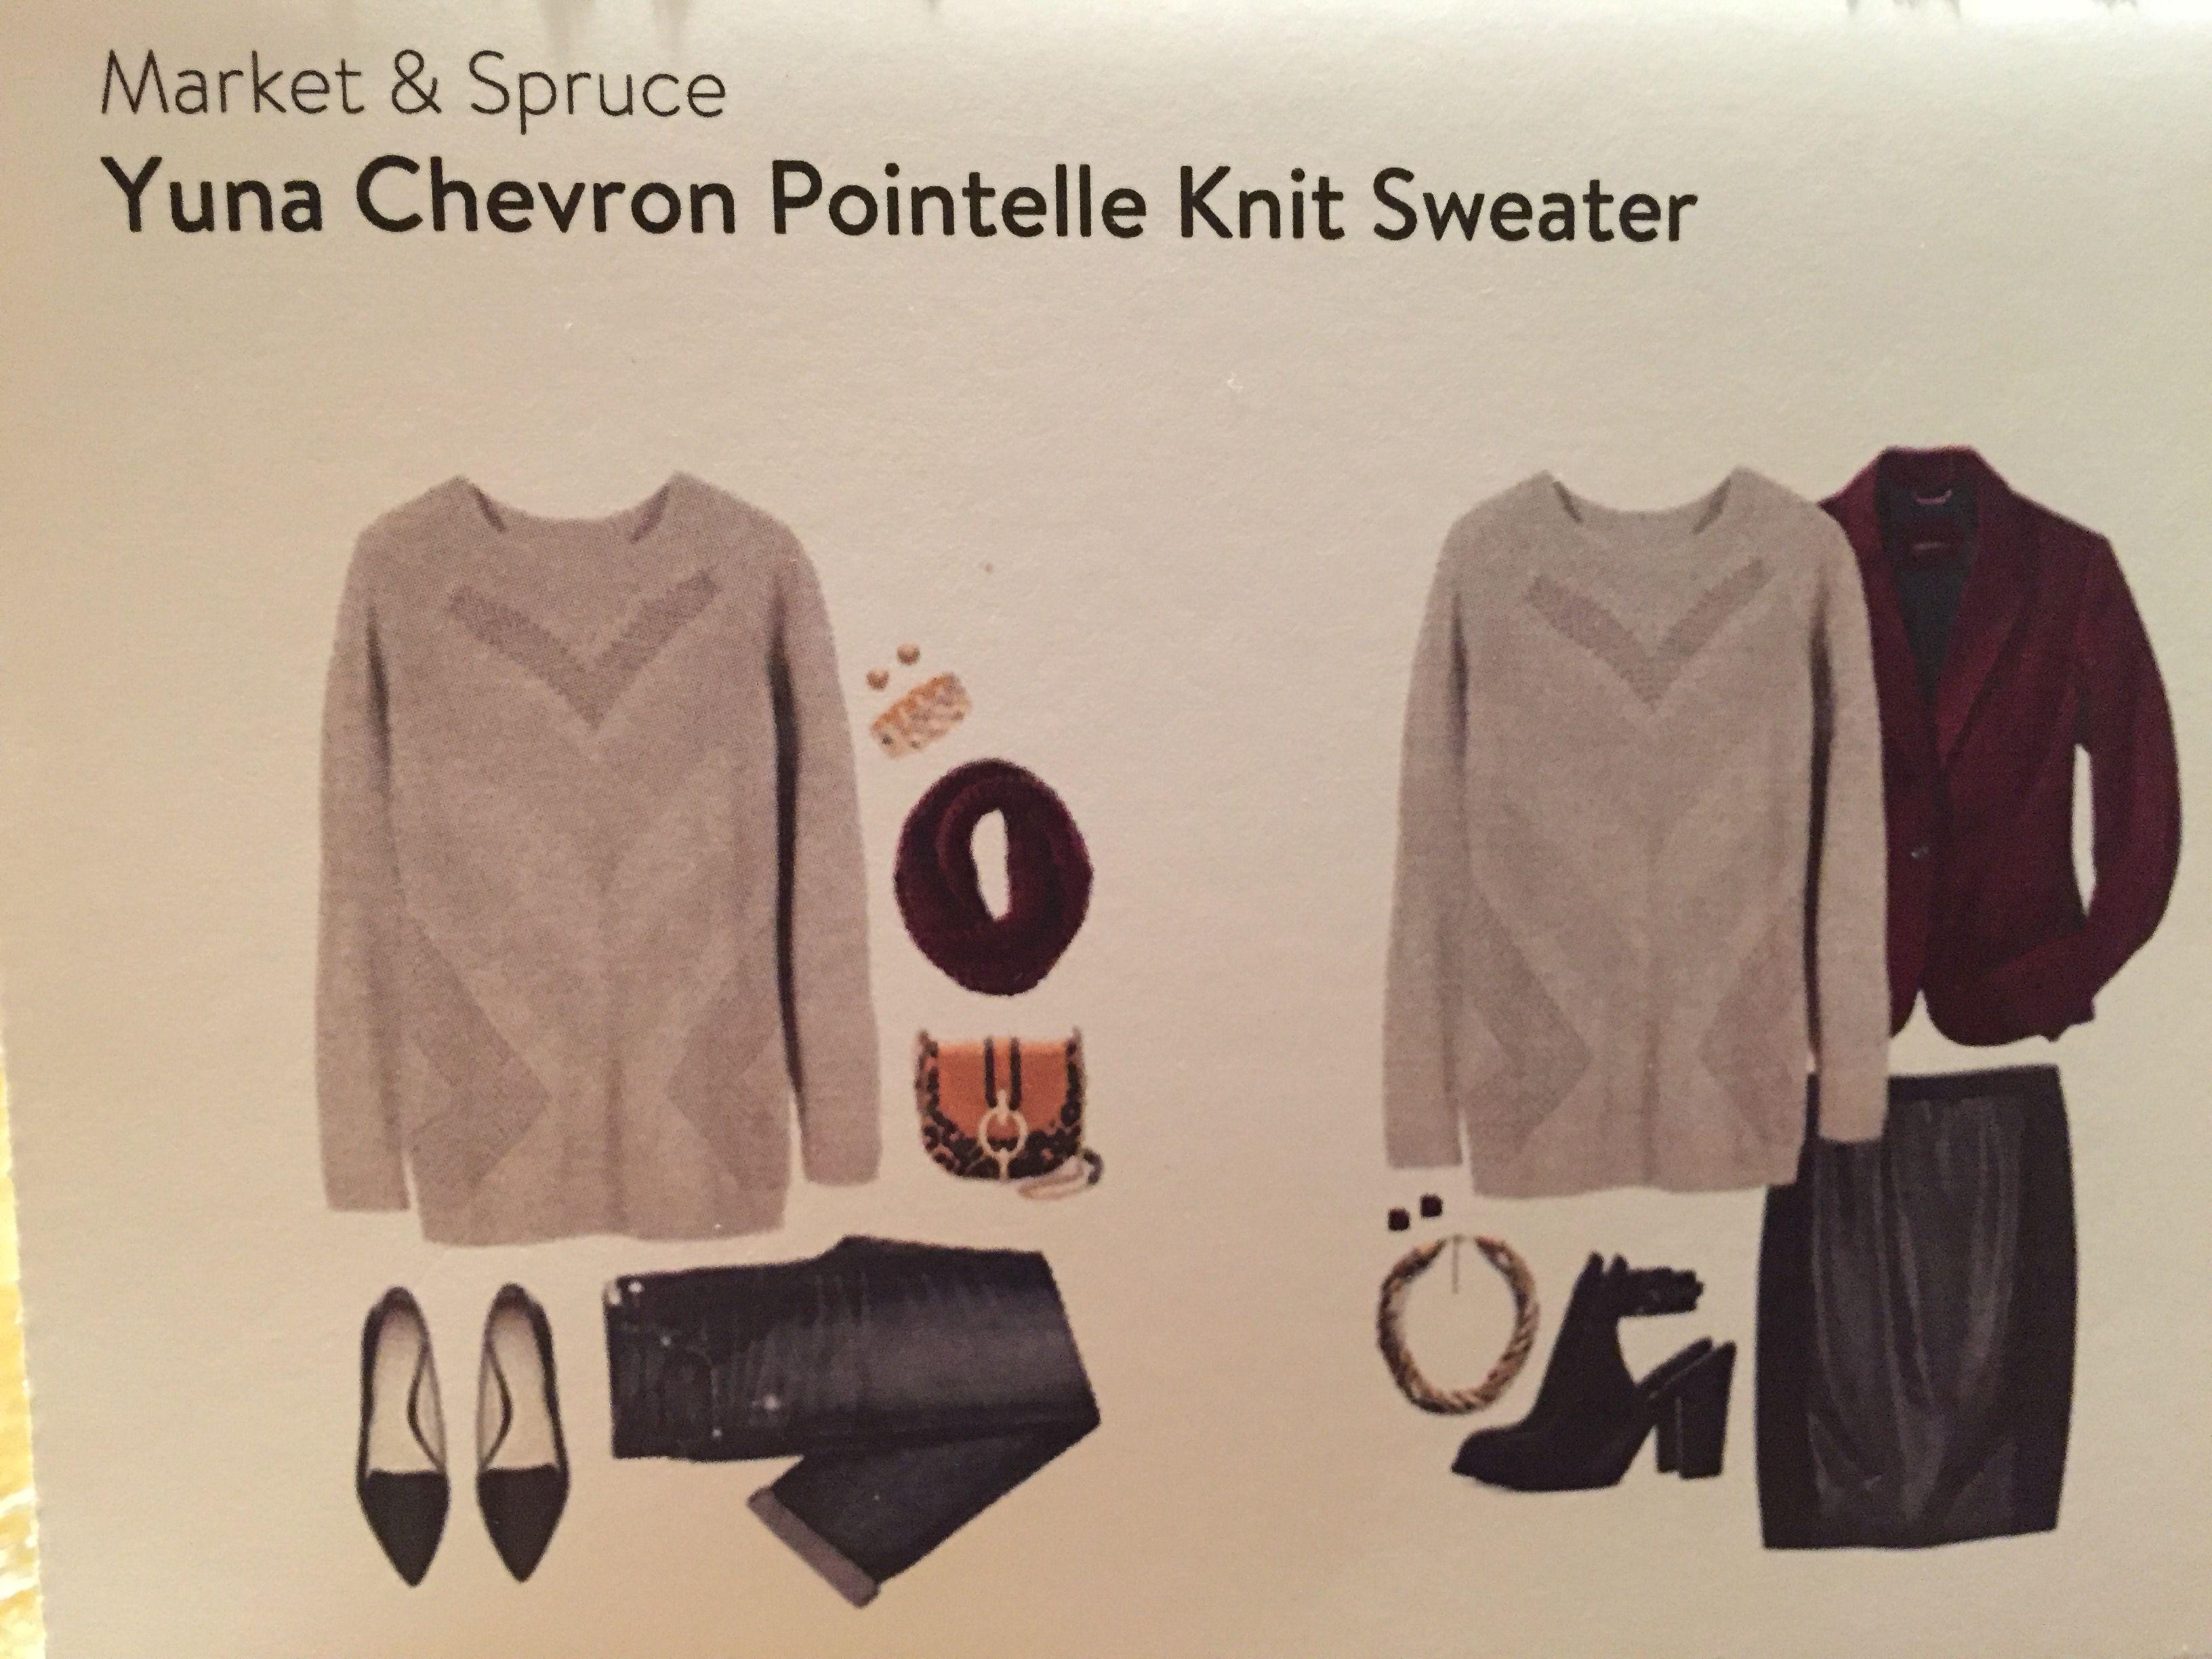 Market & Spruce Yuna Chevron Pointelle Knit Sweater